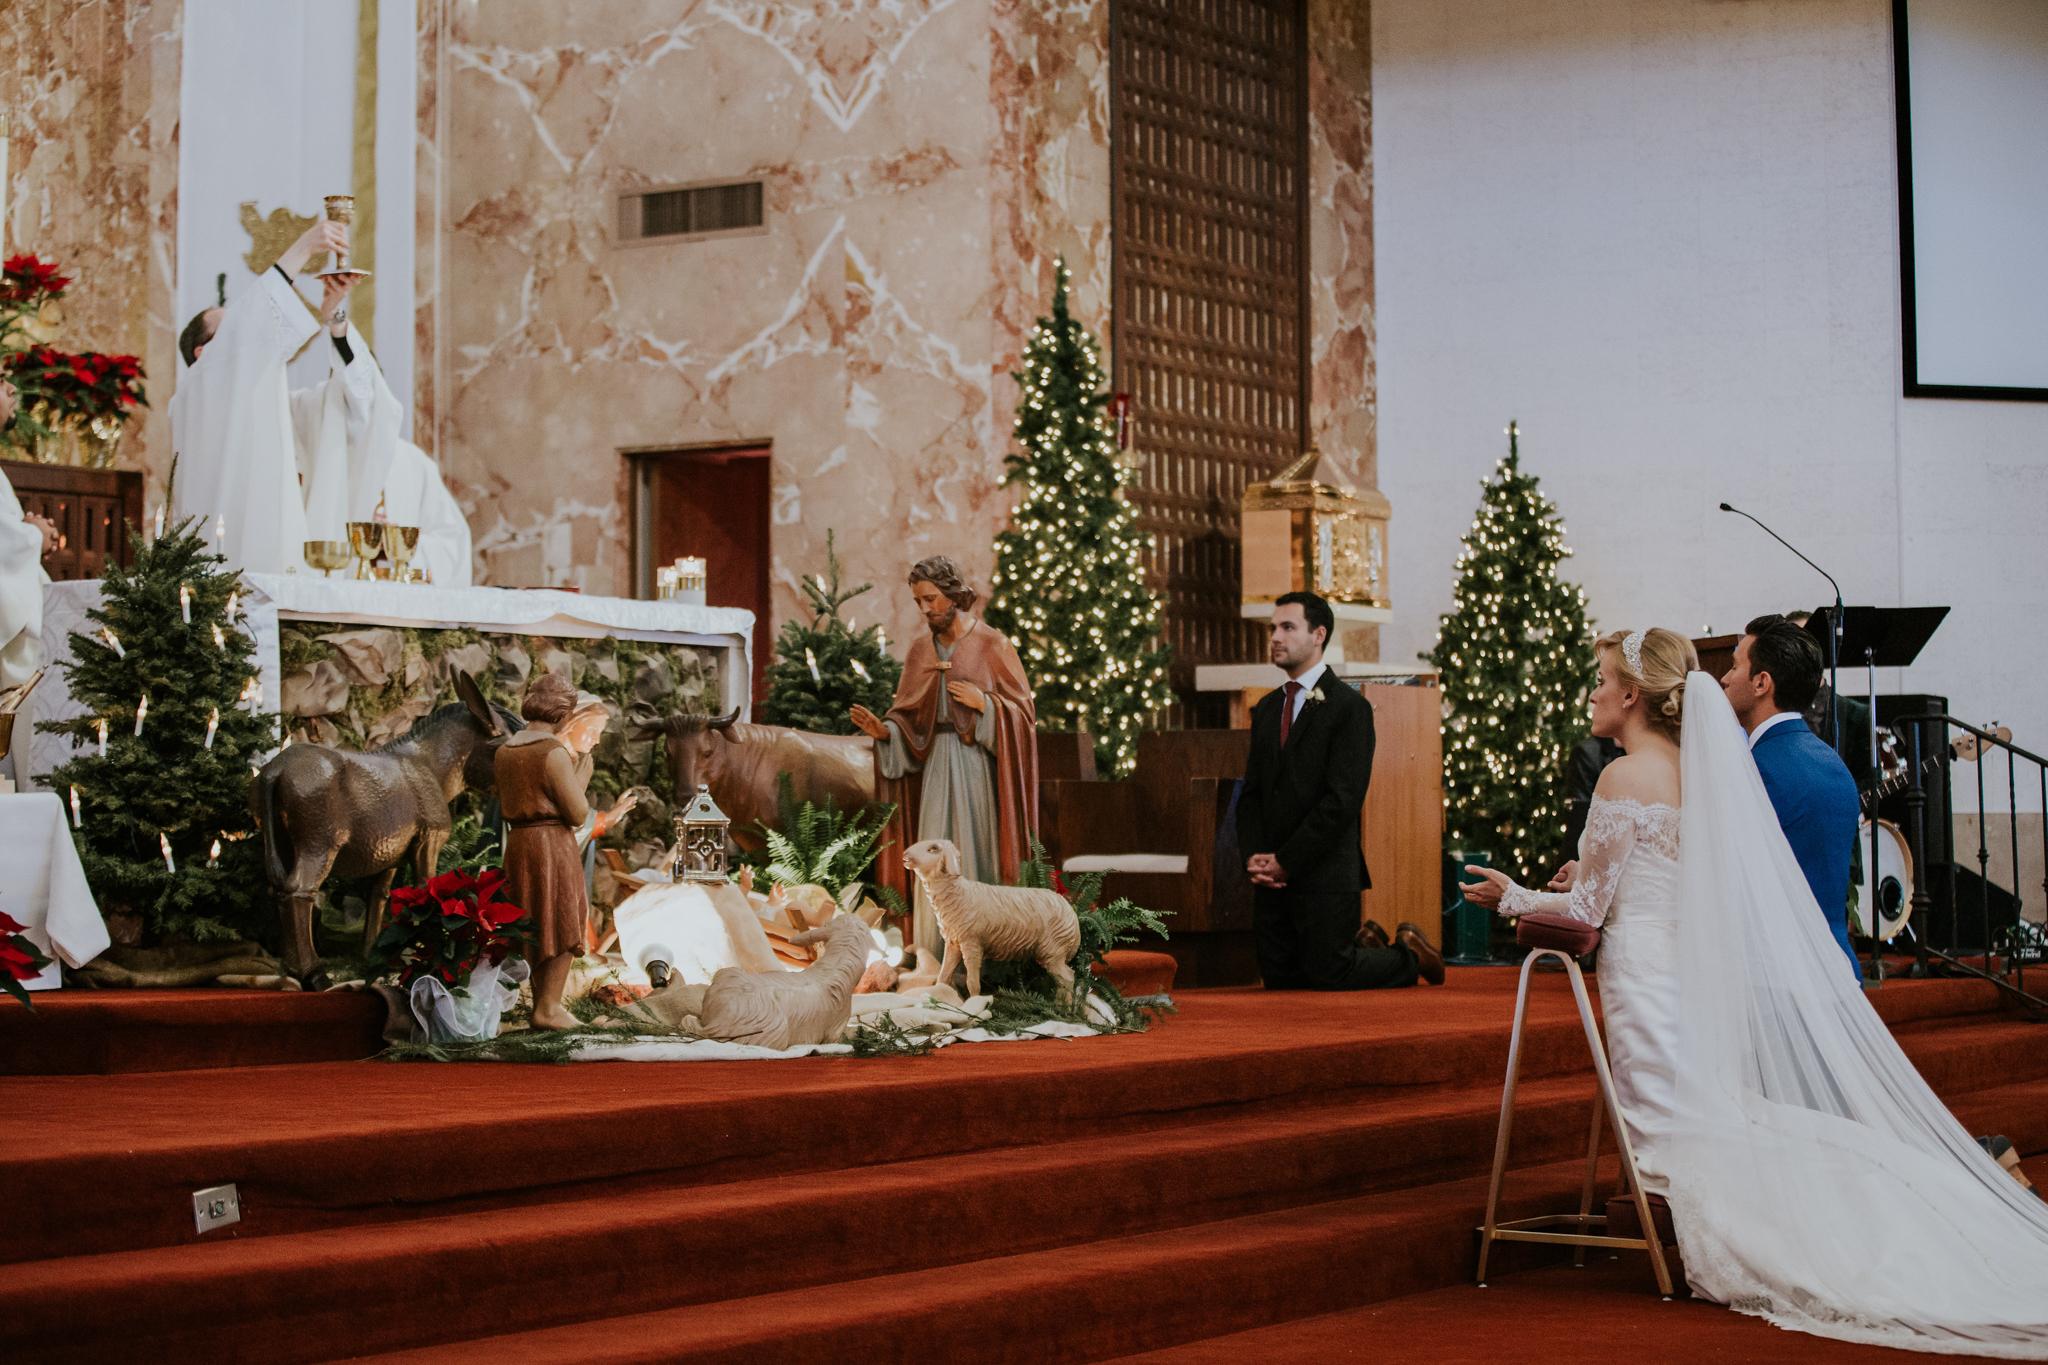 20151230_hussem_wedding_0510_web.jpg